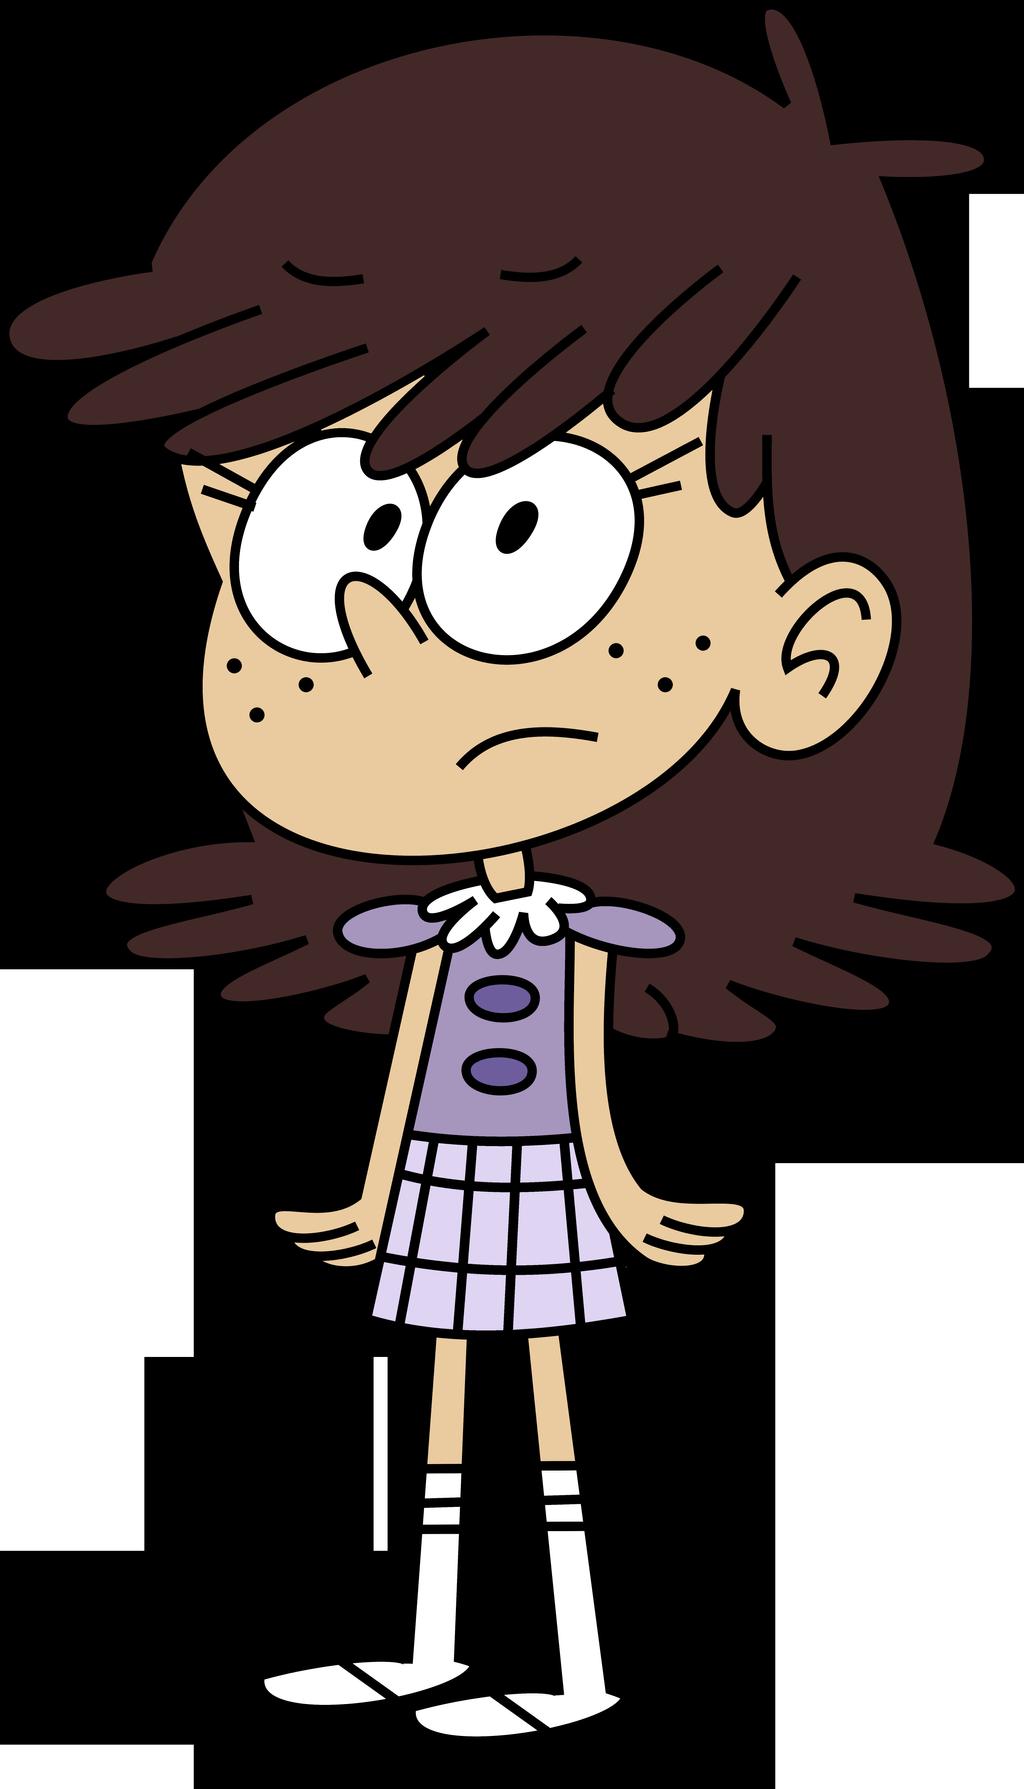 Luna Loud (11 years old) by C.